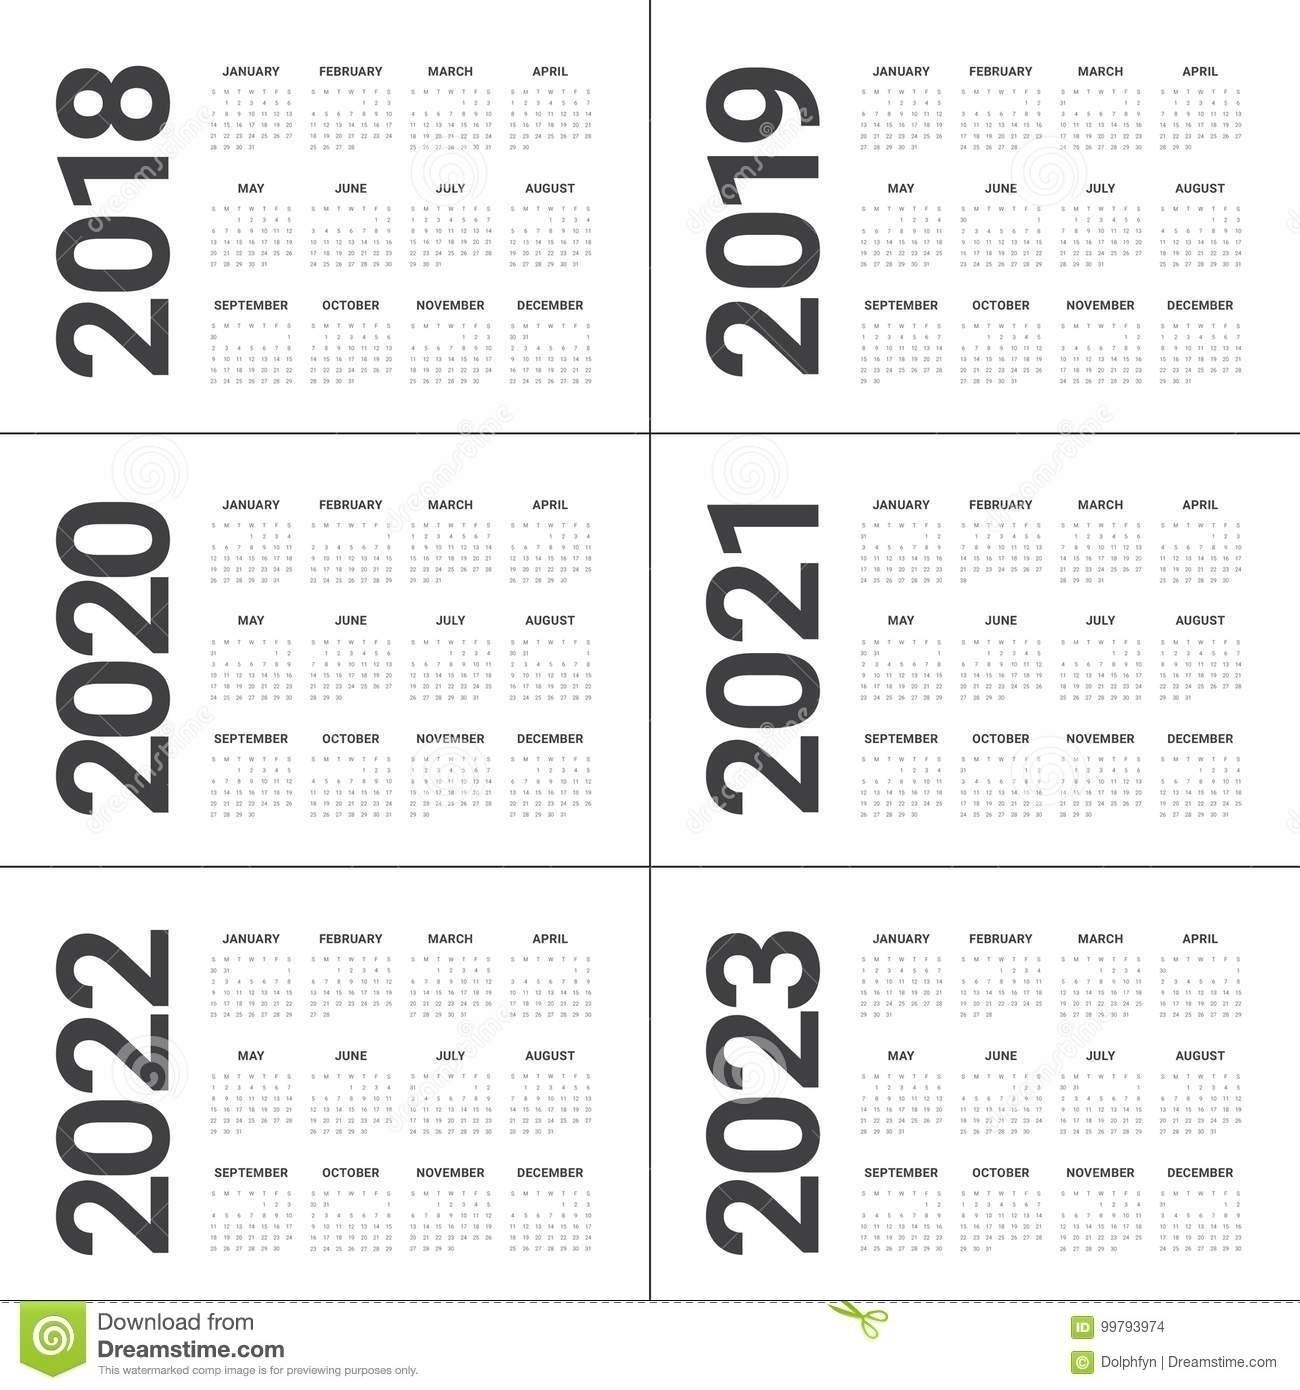 One Page Annual Calendar Printable | Template Calendar Printable for 2023 Calendar Printable One Page E Printable